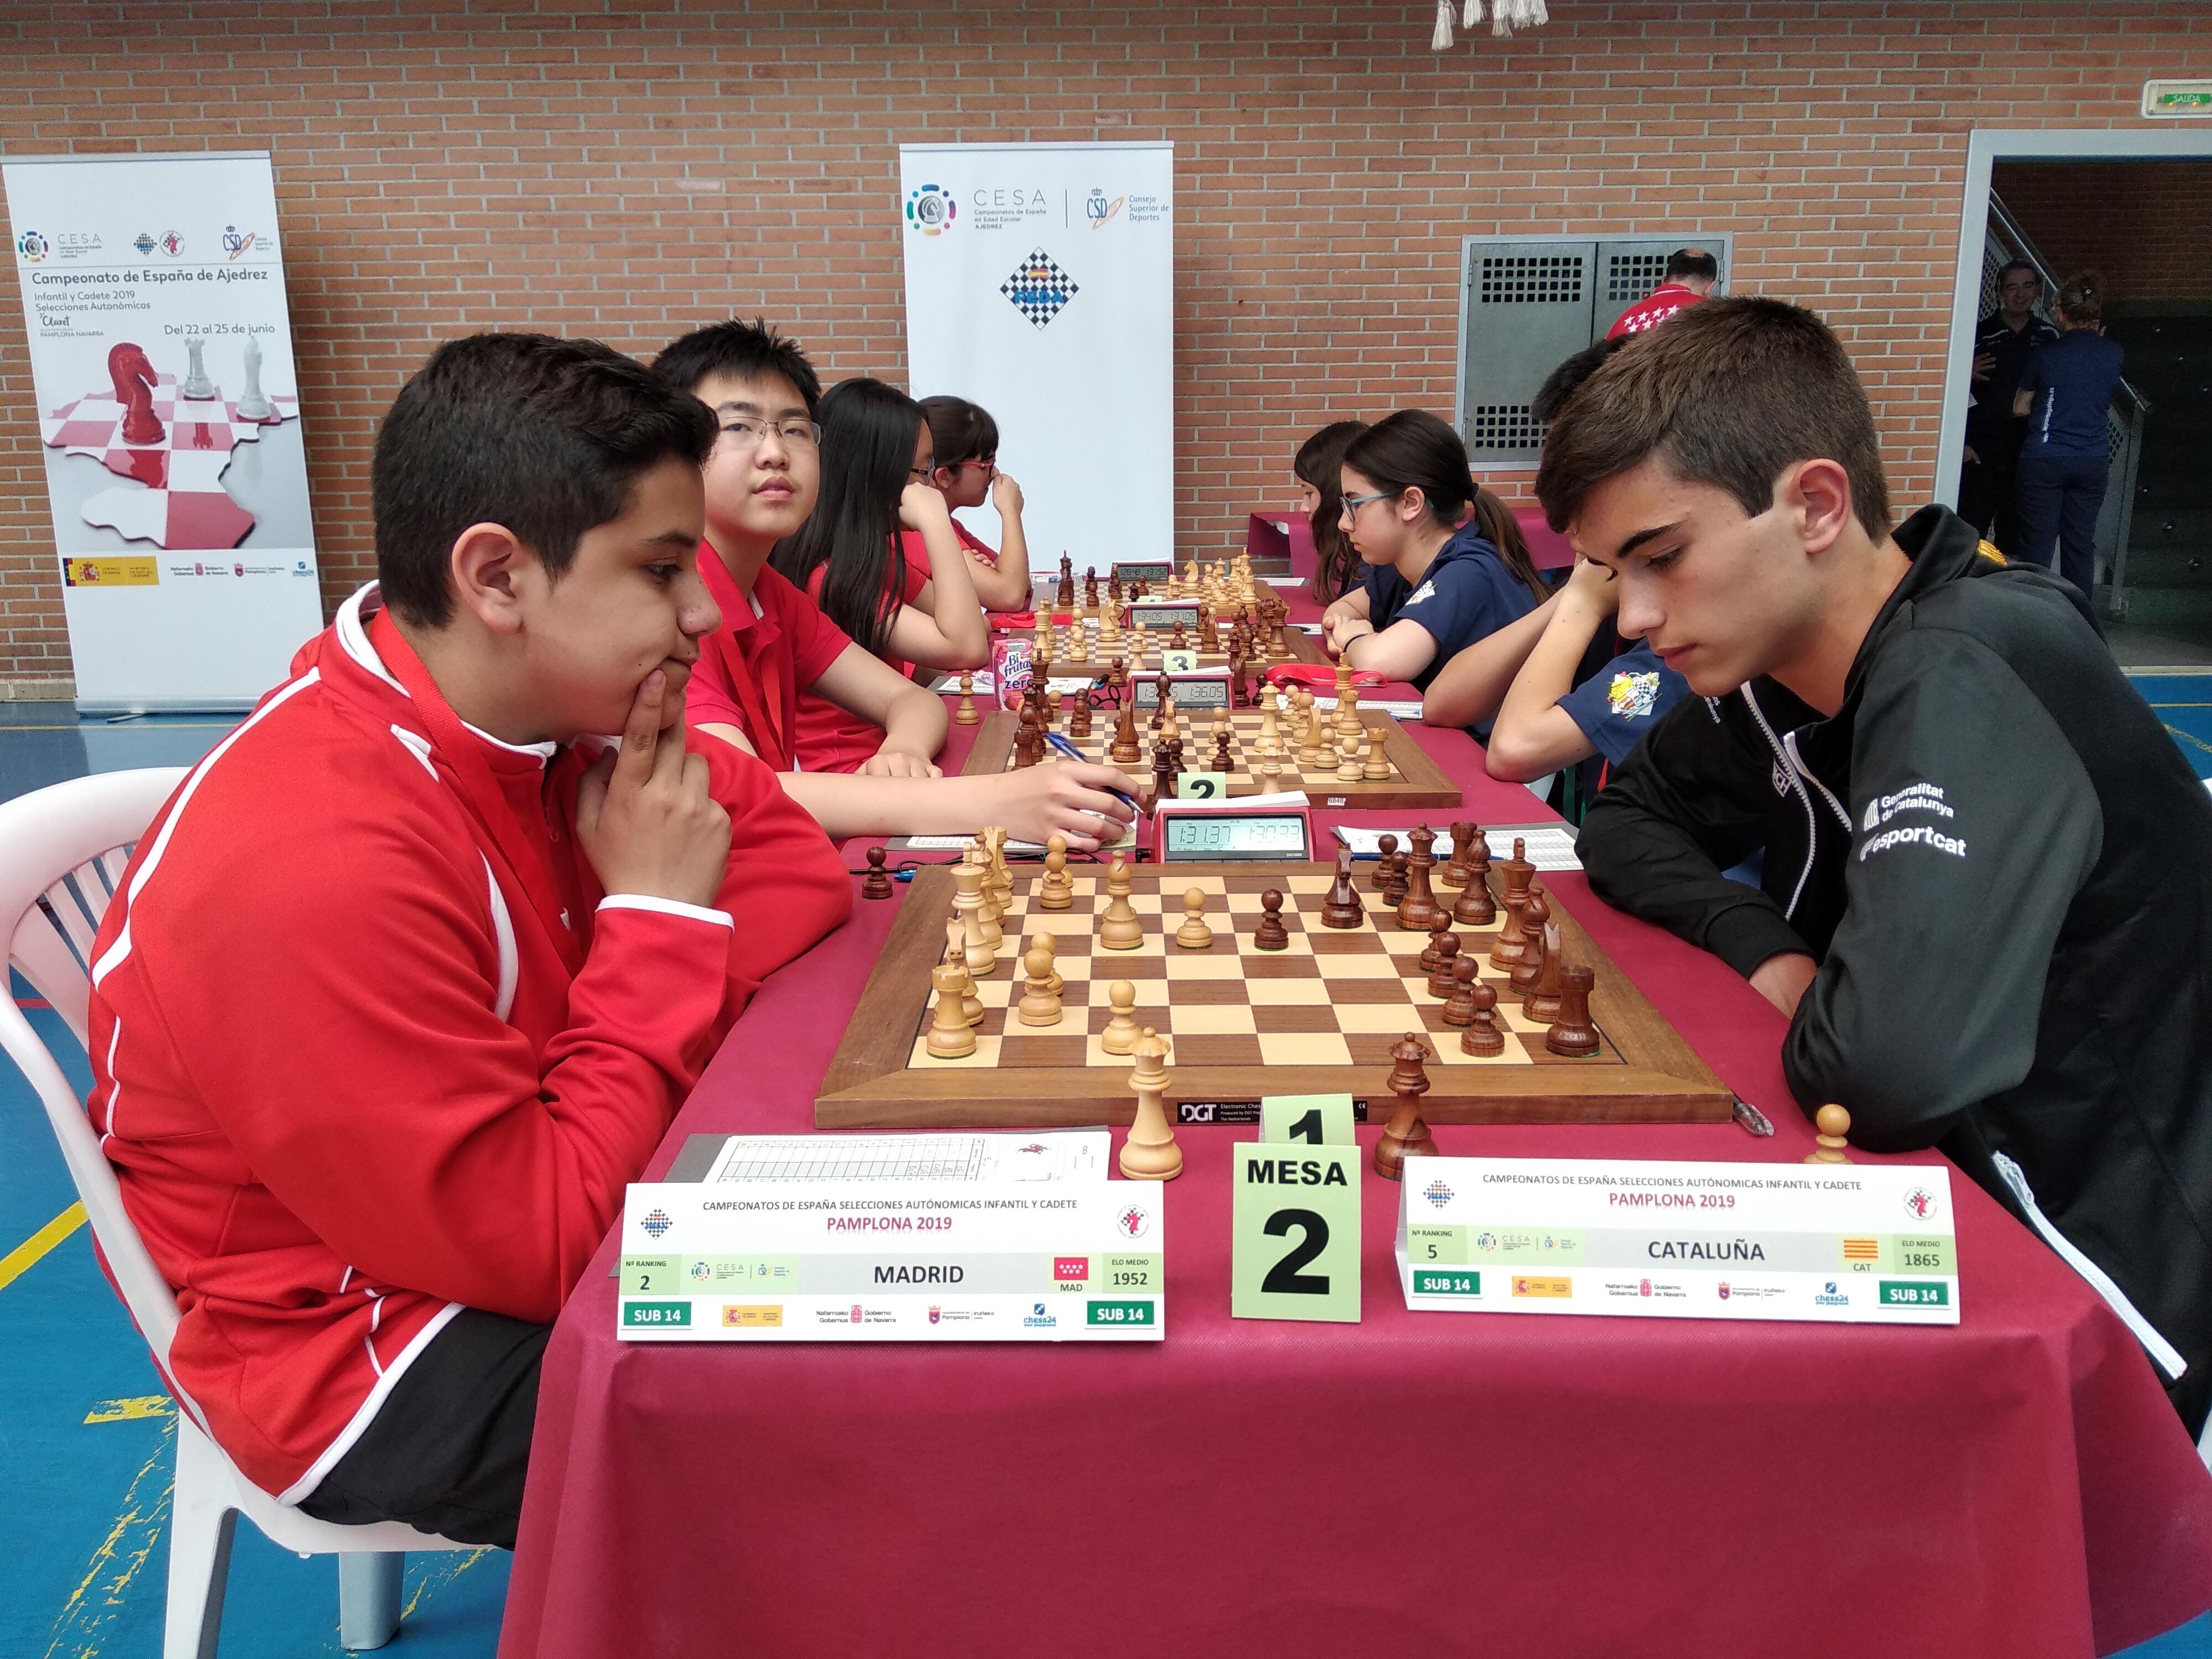 Crucial encuentro de segundo ronda contra Madrid